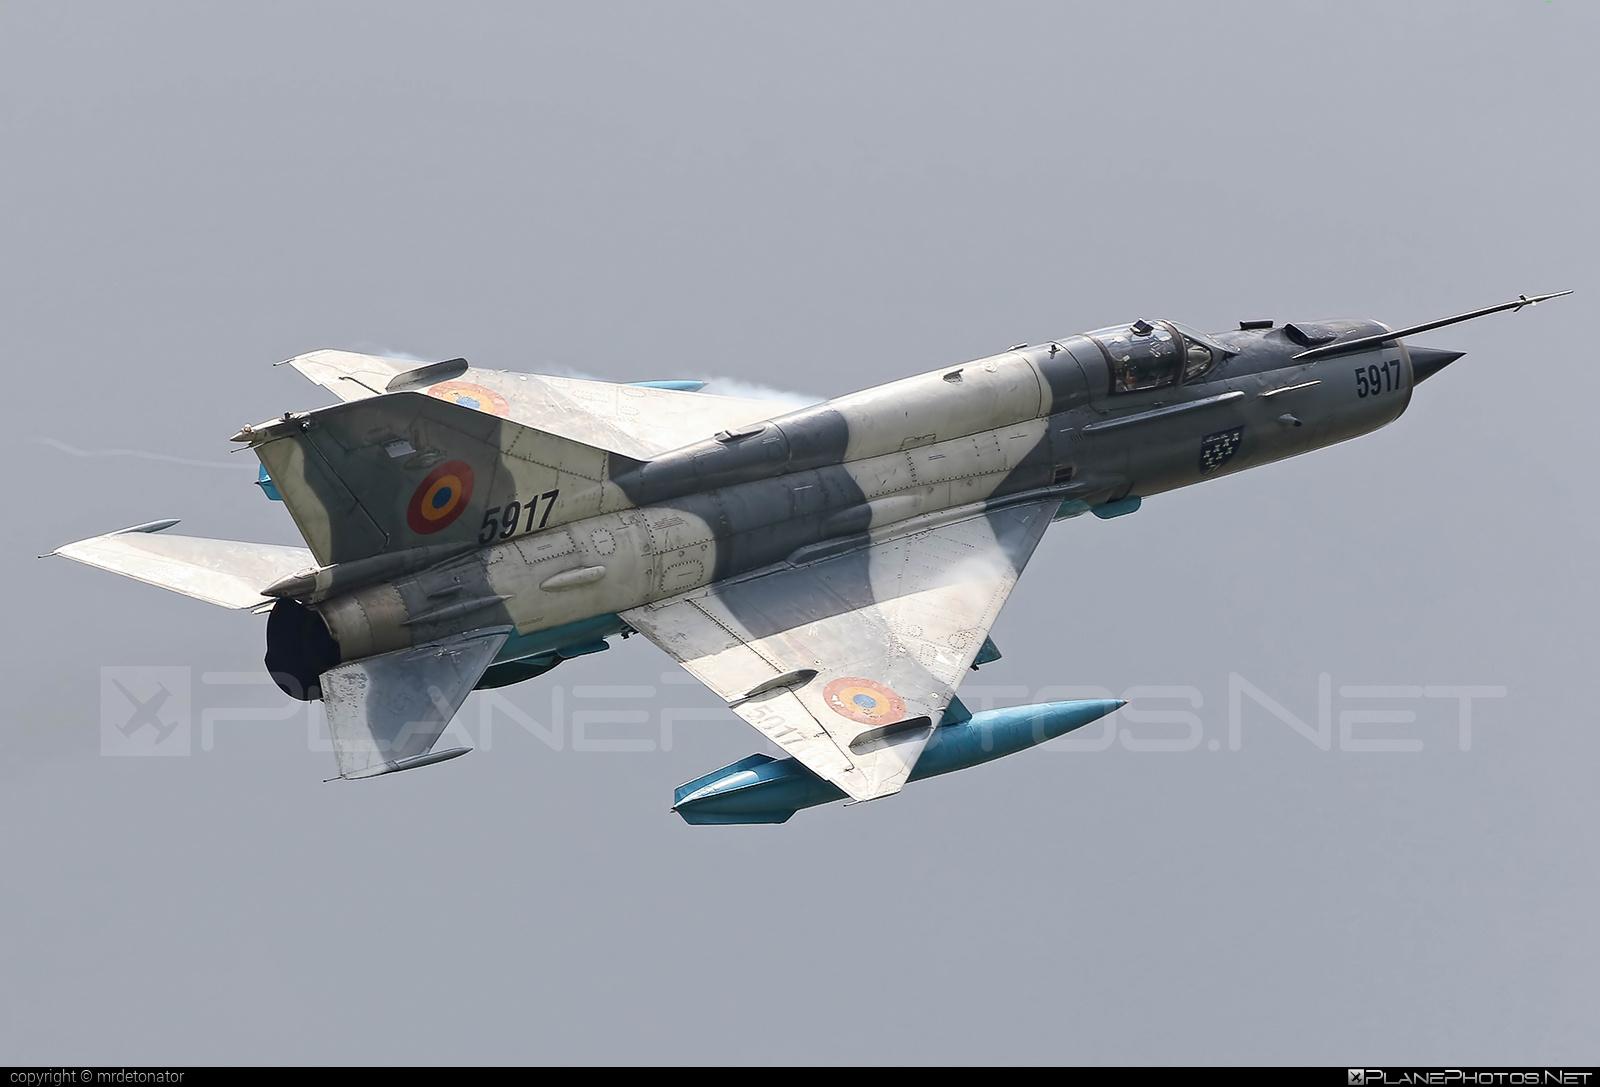 Mikoyan-Gurevich MiG-21MF - 5917 operated by Forţele Aeriene Române (Romanian Air Force) #forteleaerieneromane #mig #mig21 #mig21mf #mikoyangurevich #romanianairforce